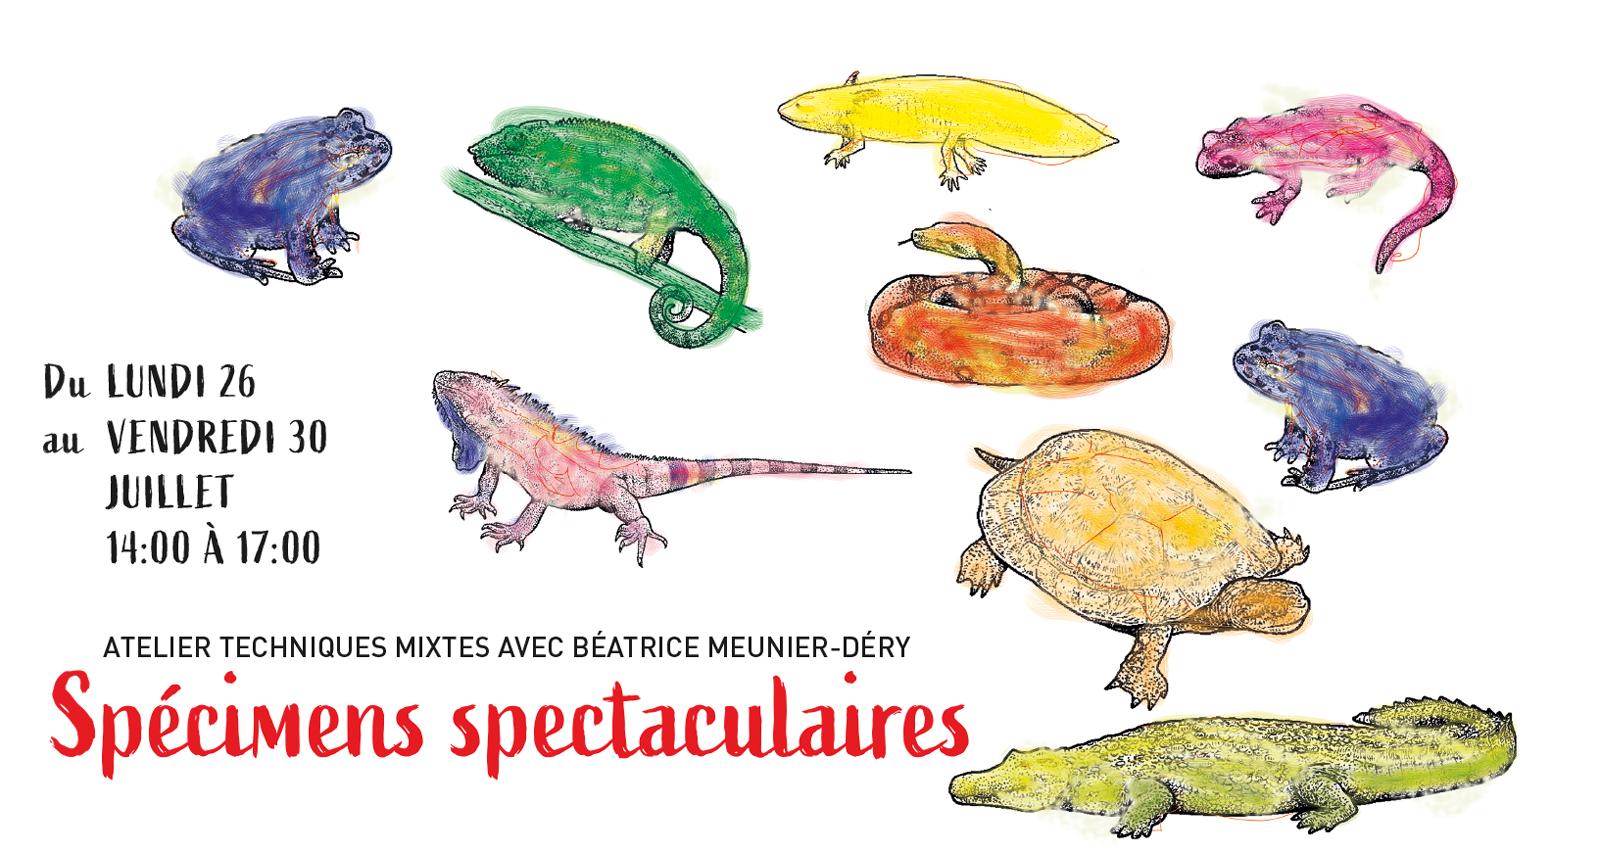 Specimens Spectaculaires